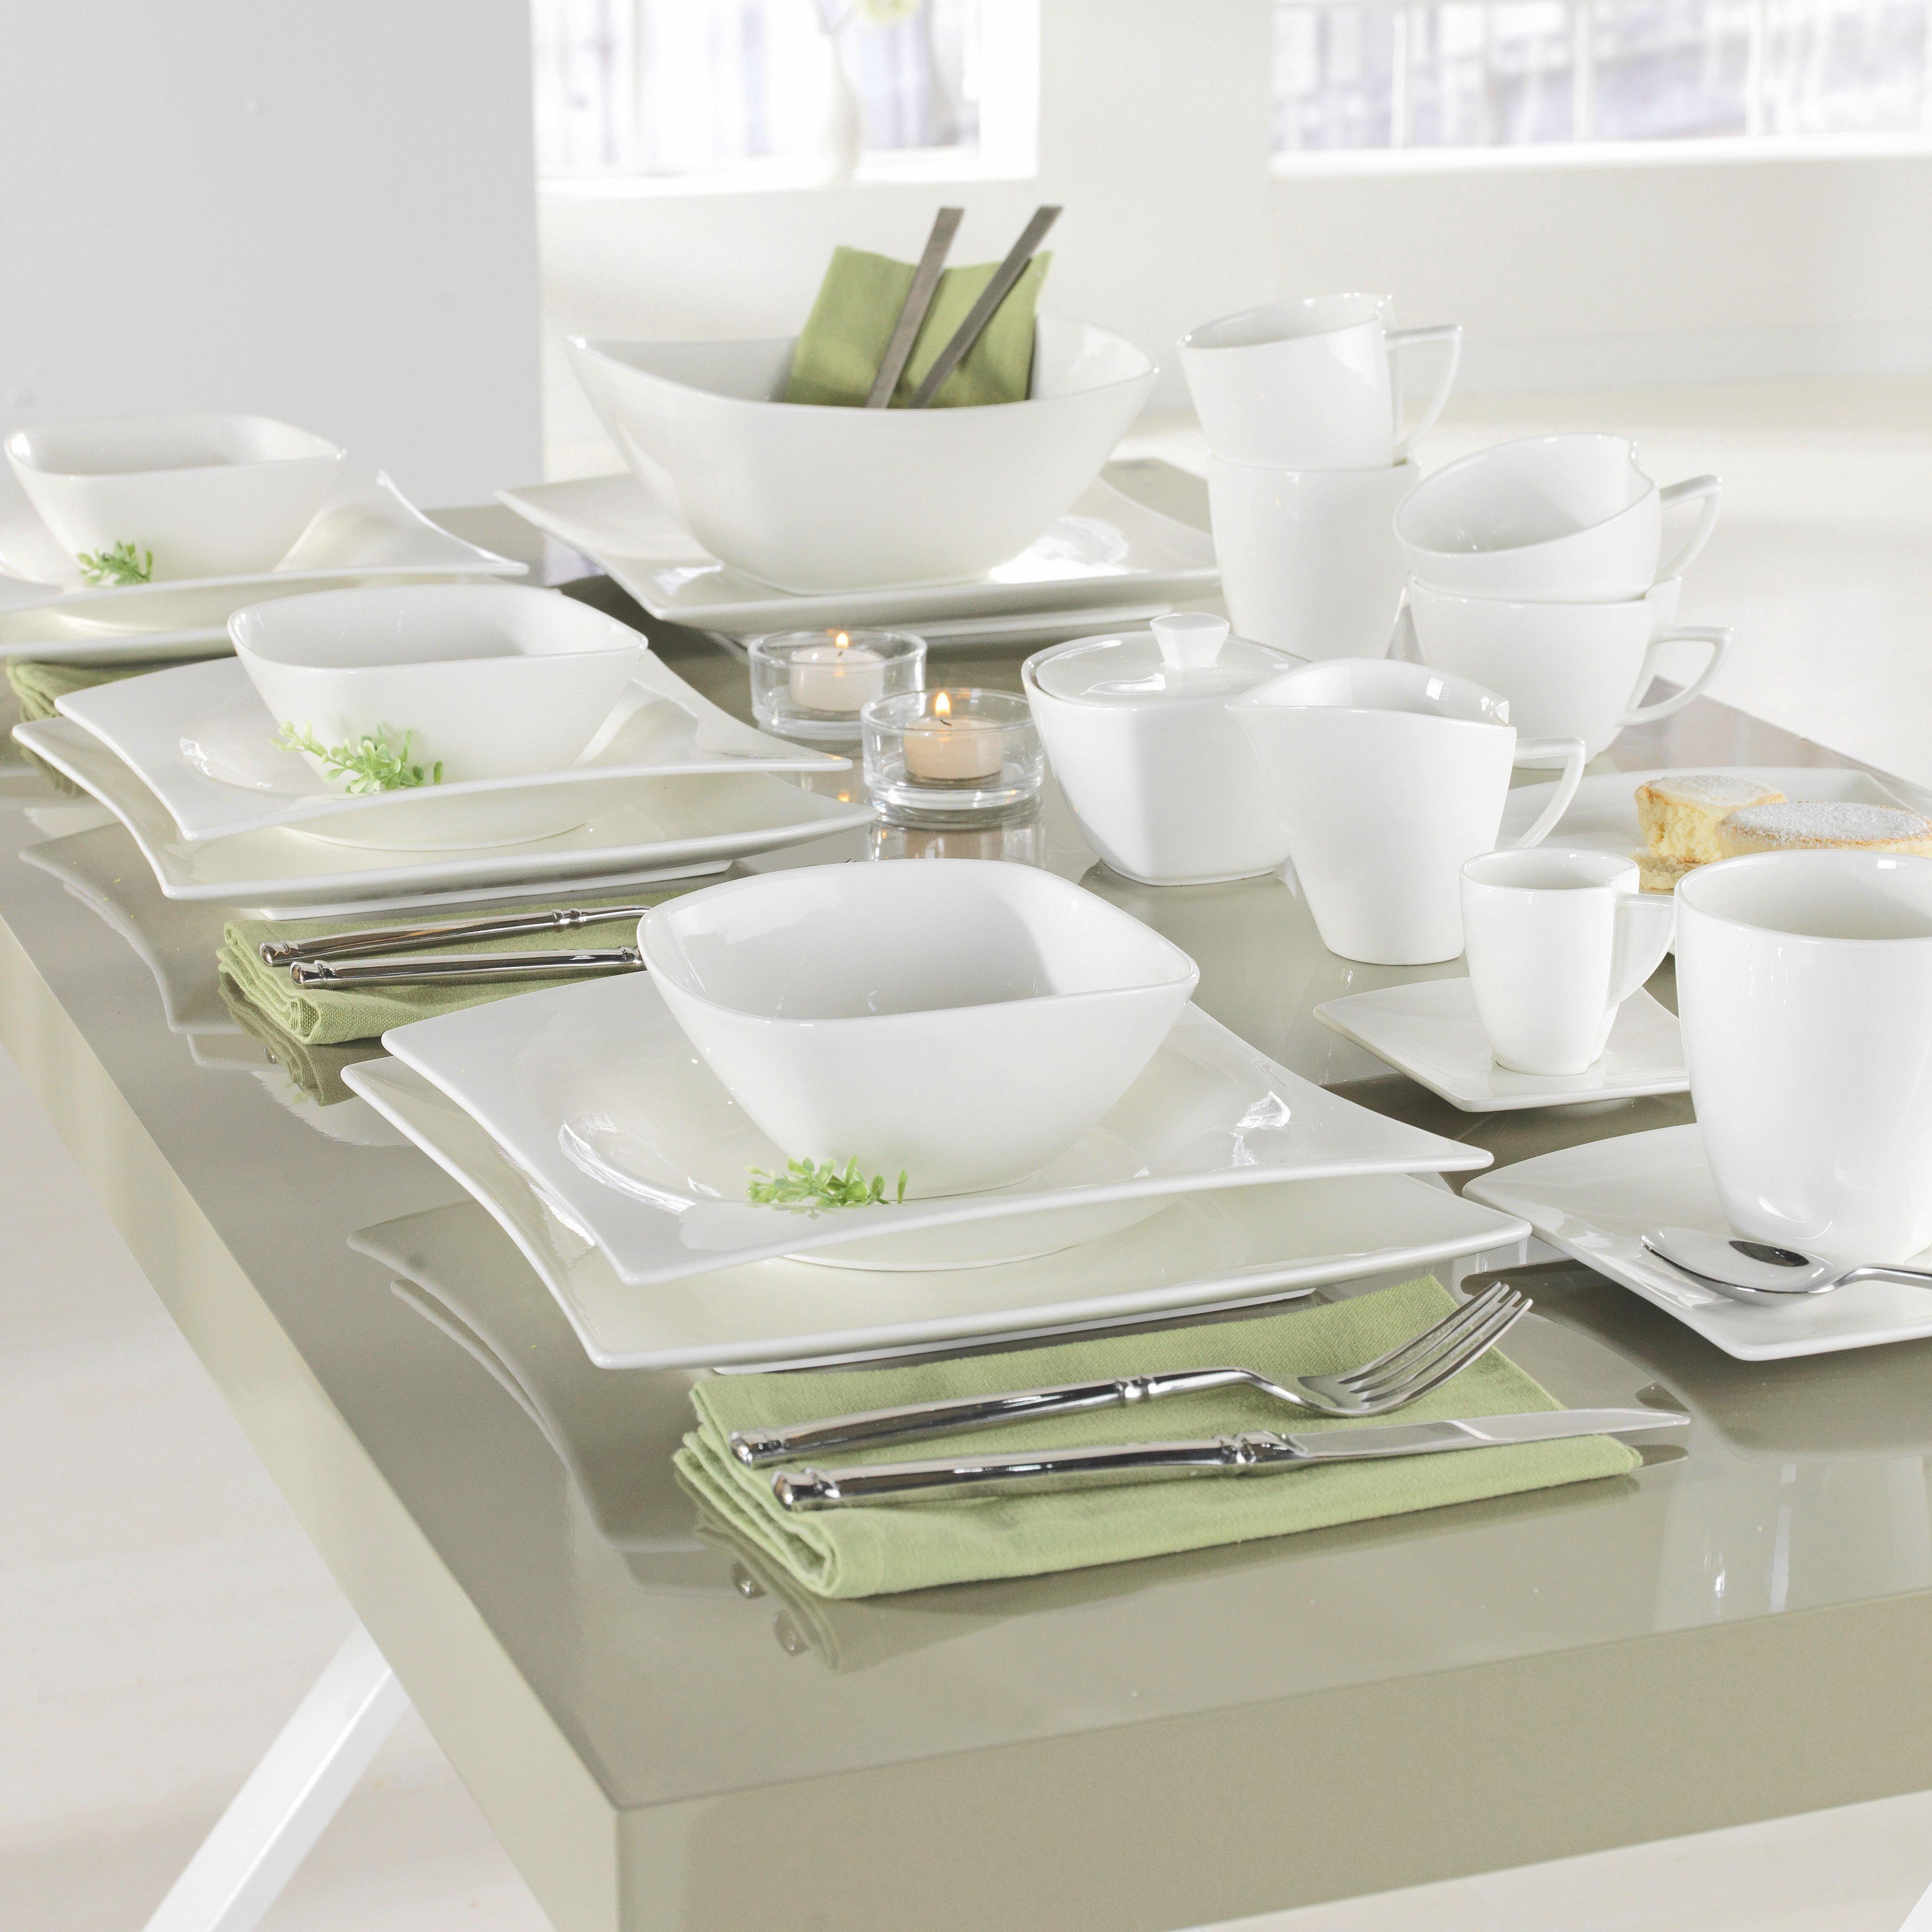 Cukřenka Tacoma -top- - bílá, Lifestyle, keramika (11/7,4/11cm) - PREMIUM LIVING